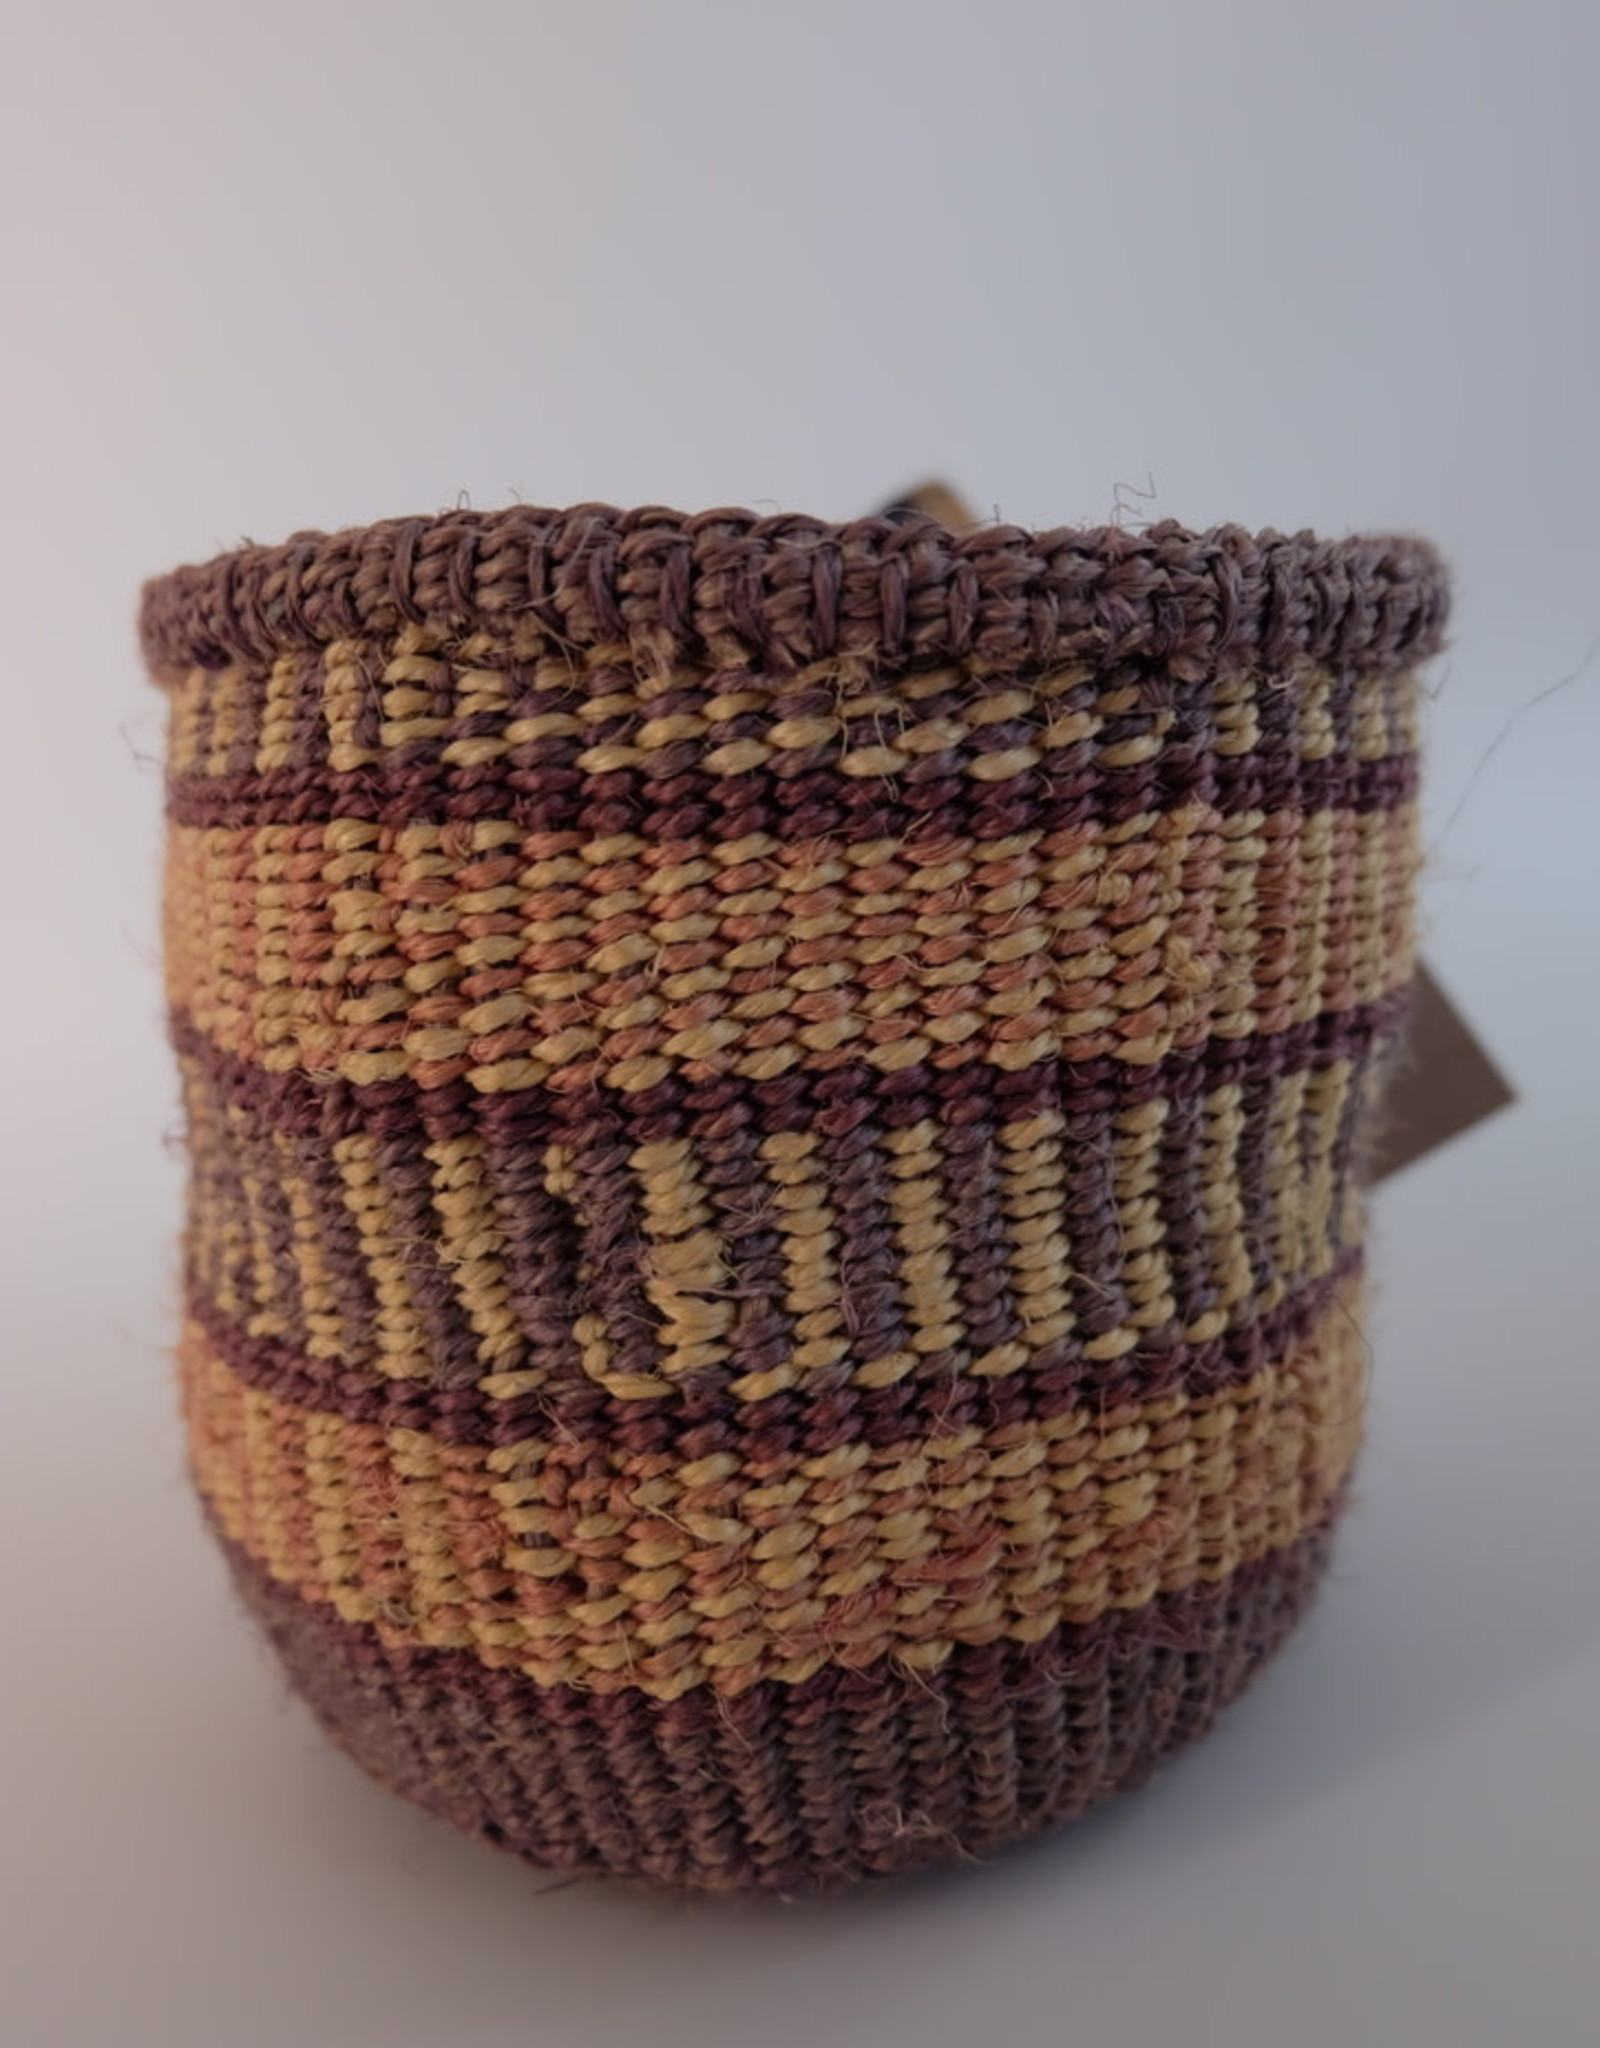 Solid Crafts Hadithi Basket XS - grey & purple by Pamela